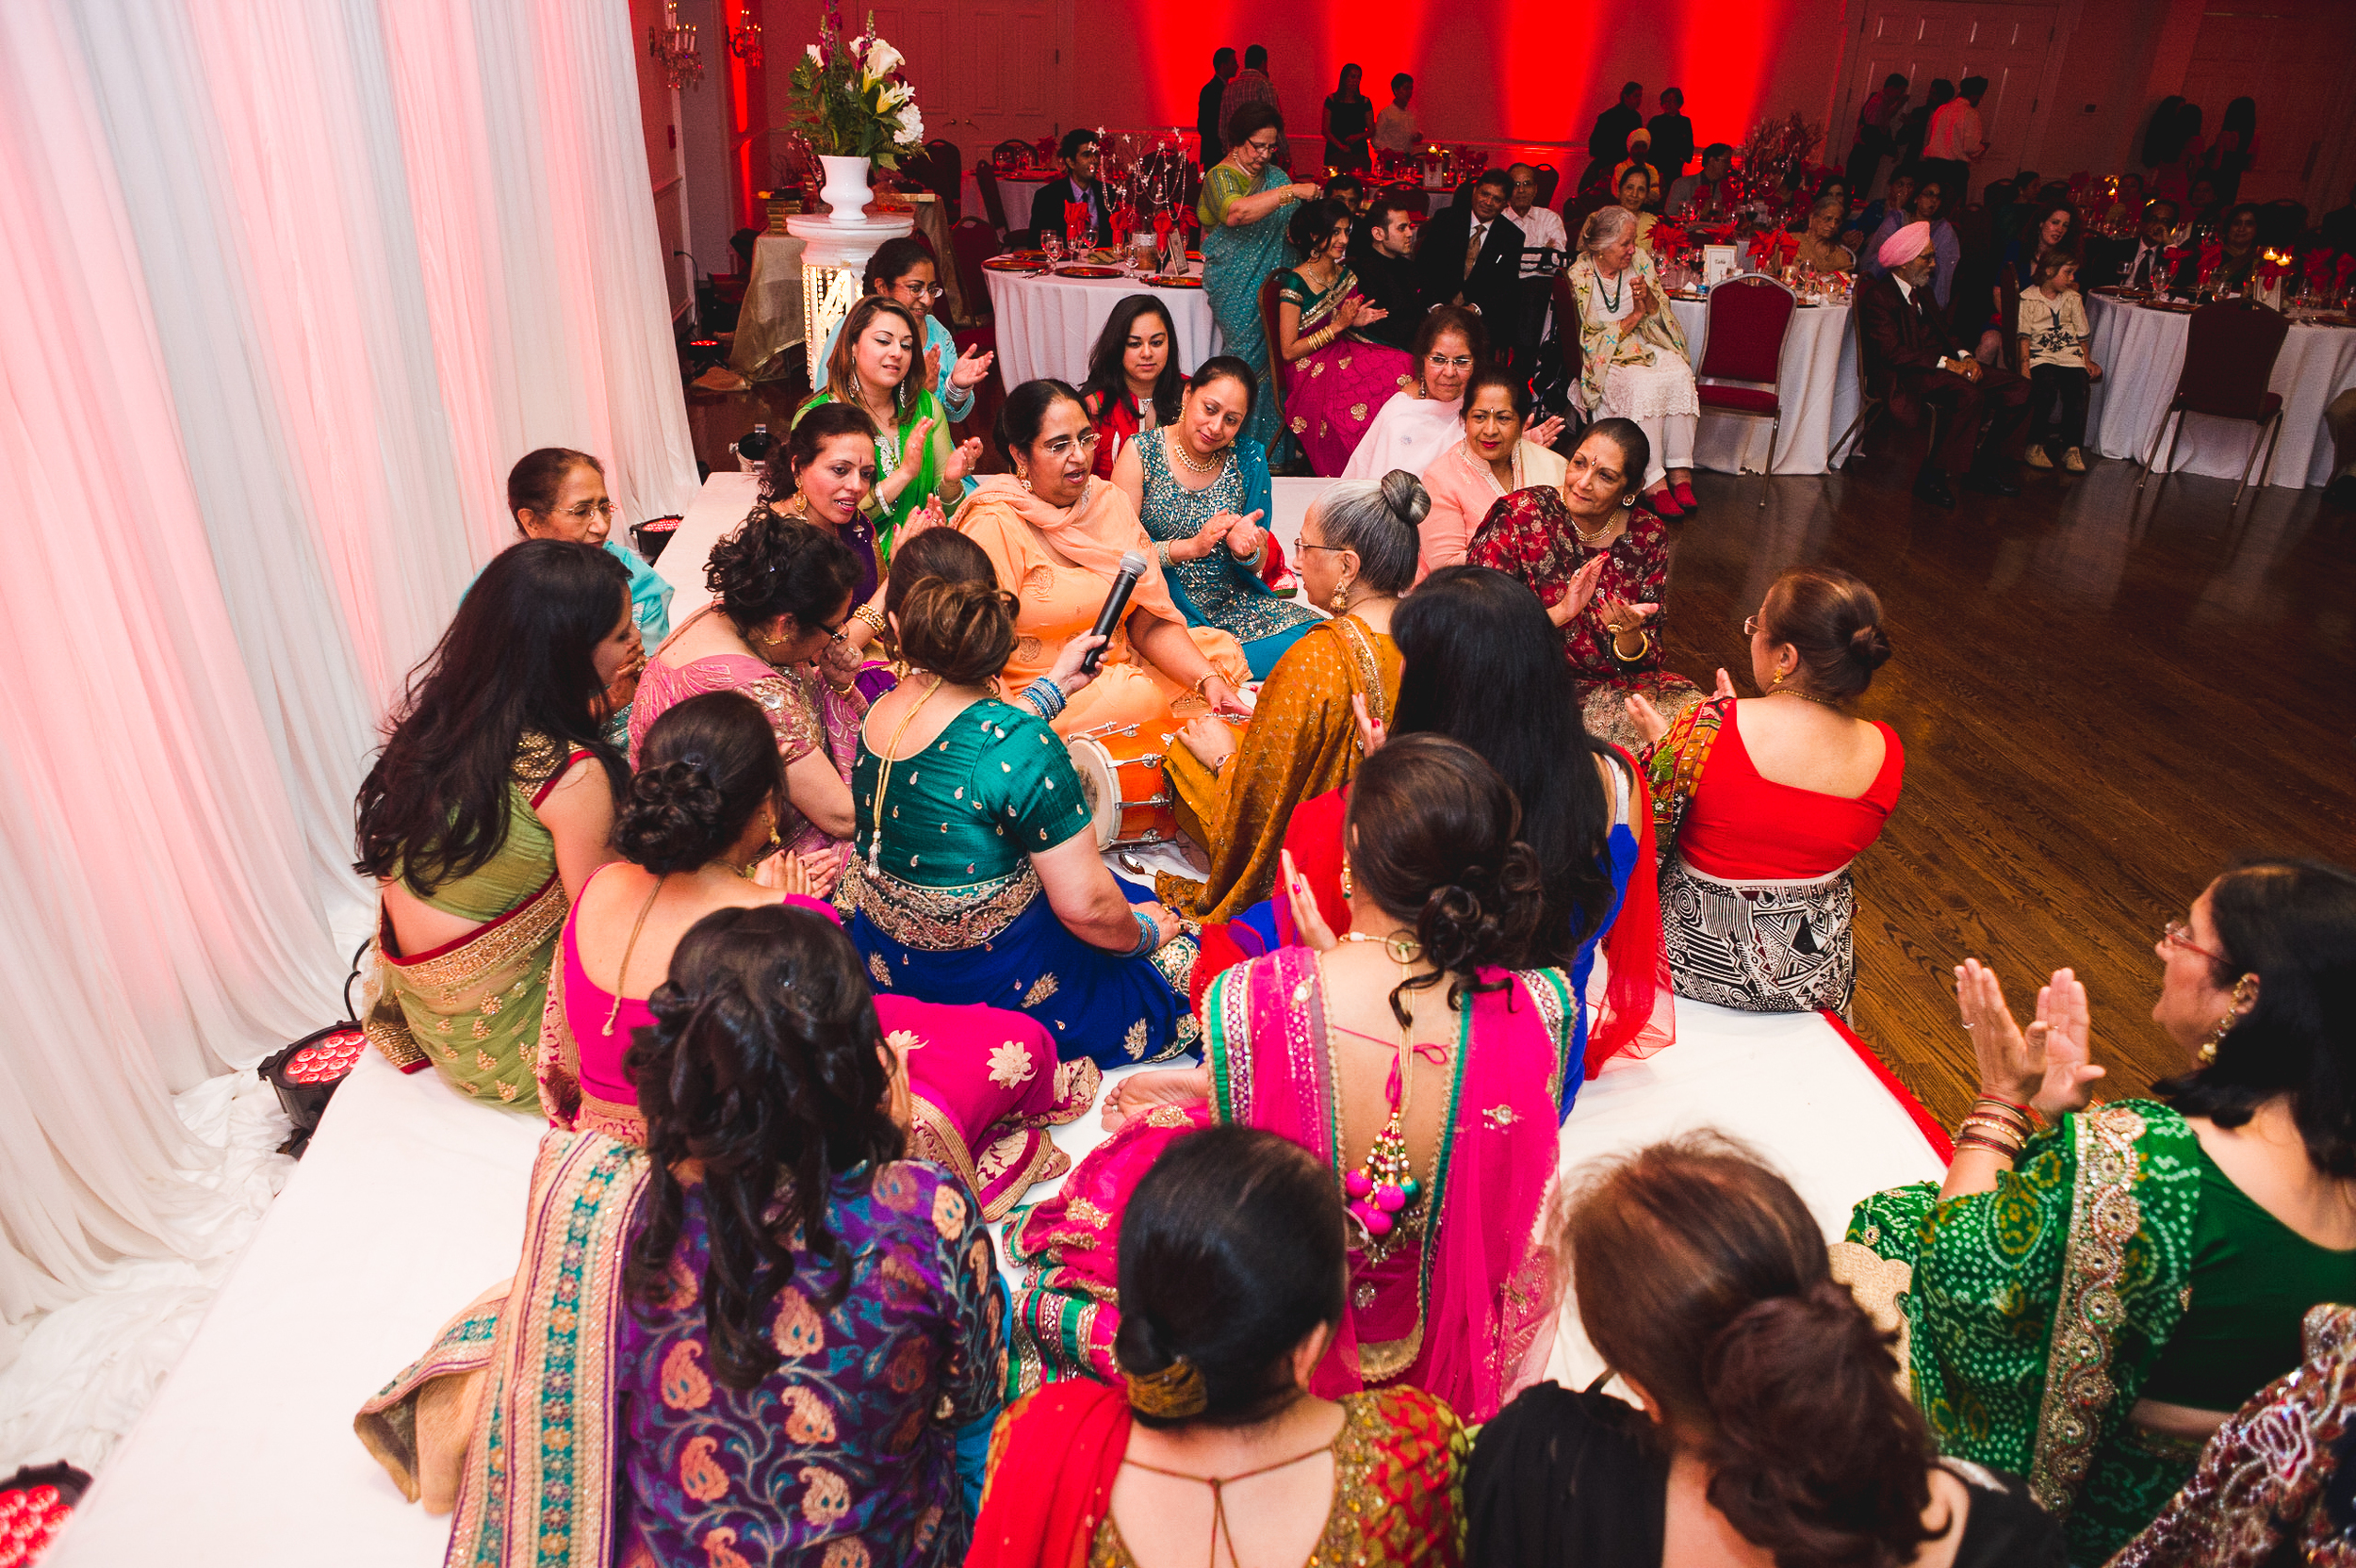 Indian wedding photographer washington dc Mantas Kubilinskas-14.jpg